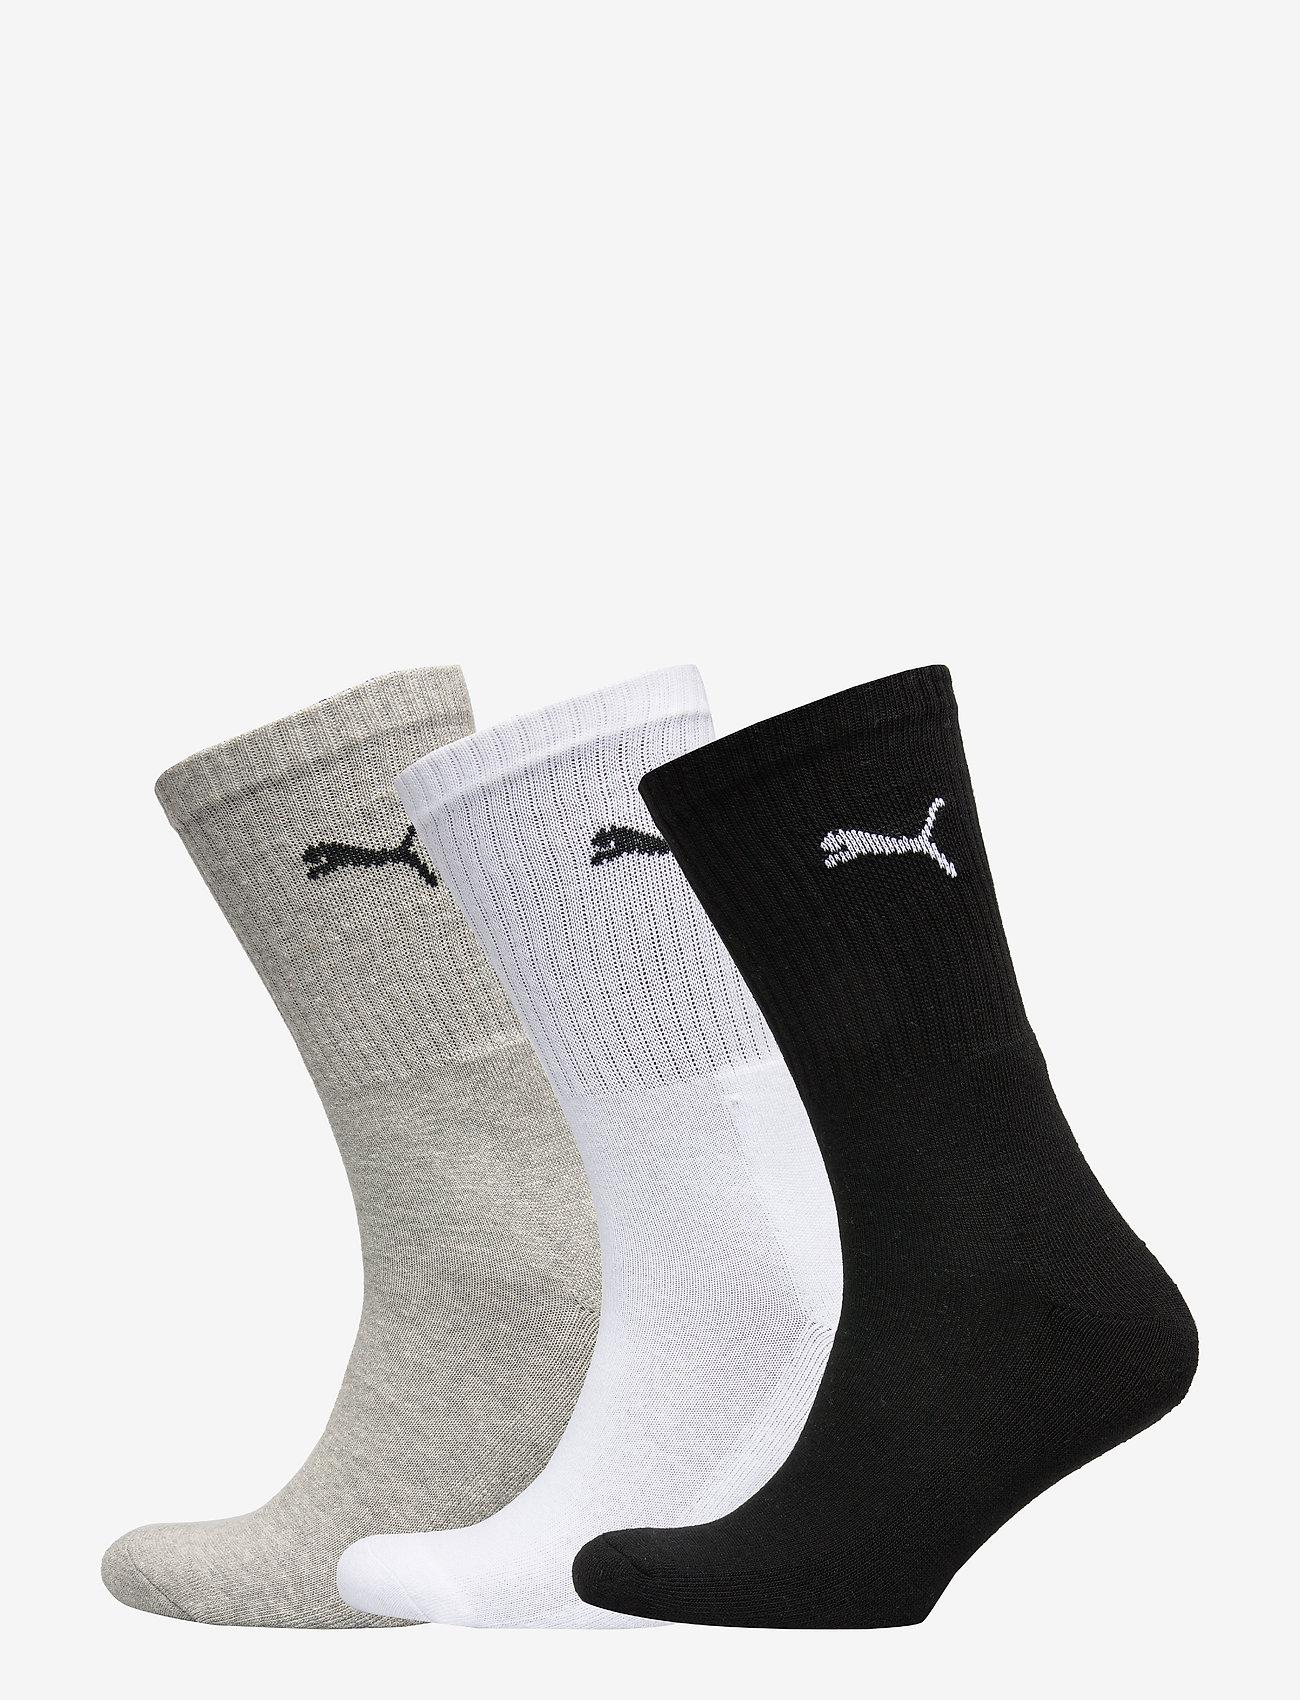 PUMA - PUMA CREW SOCK 3P - vanliga strumpor - white / grey / black - 0